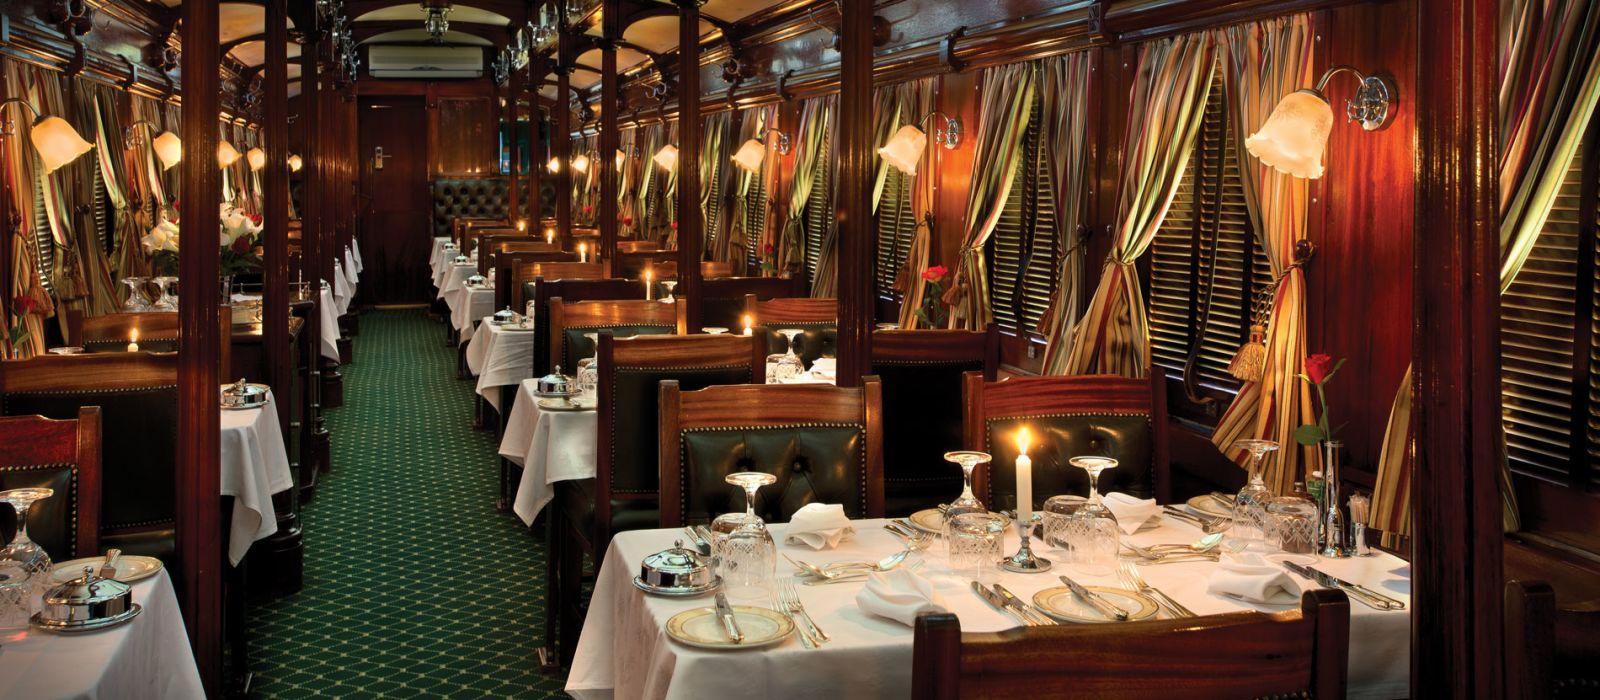 Hotel Rovos Rail: Pretoria – Victoria Falls South Africa